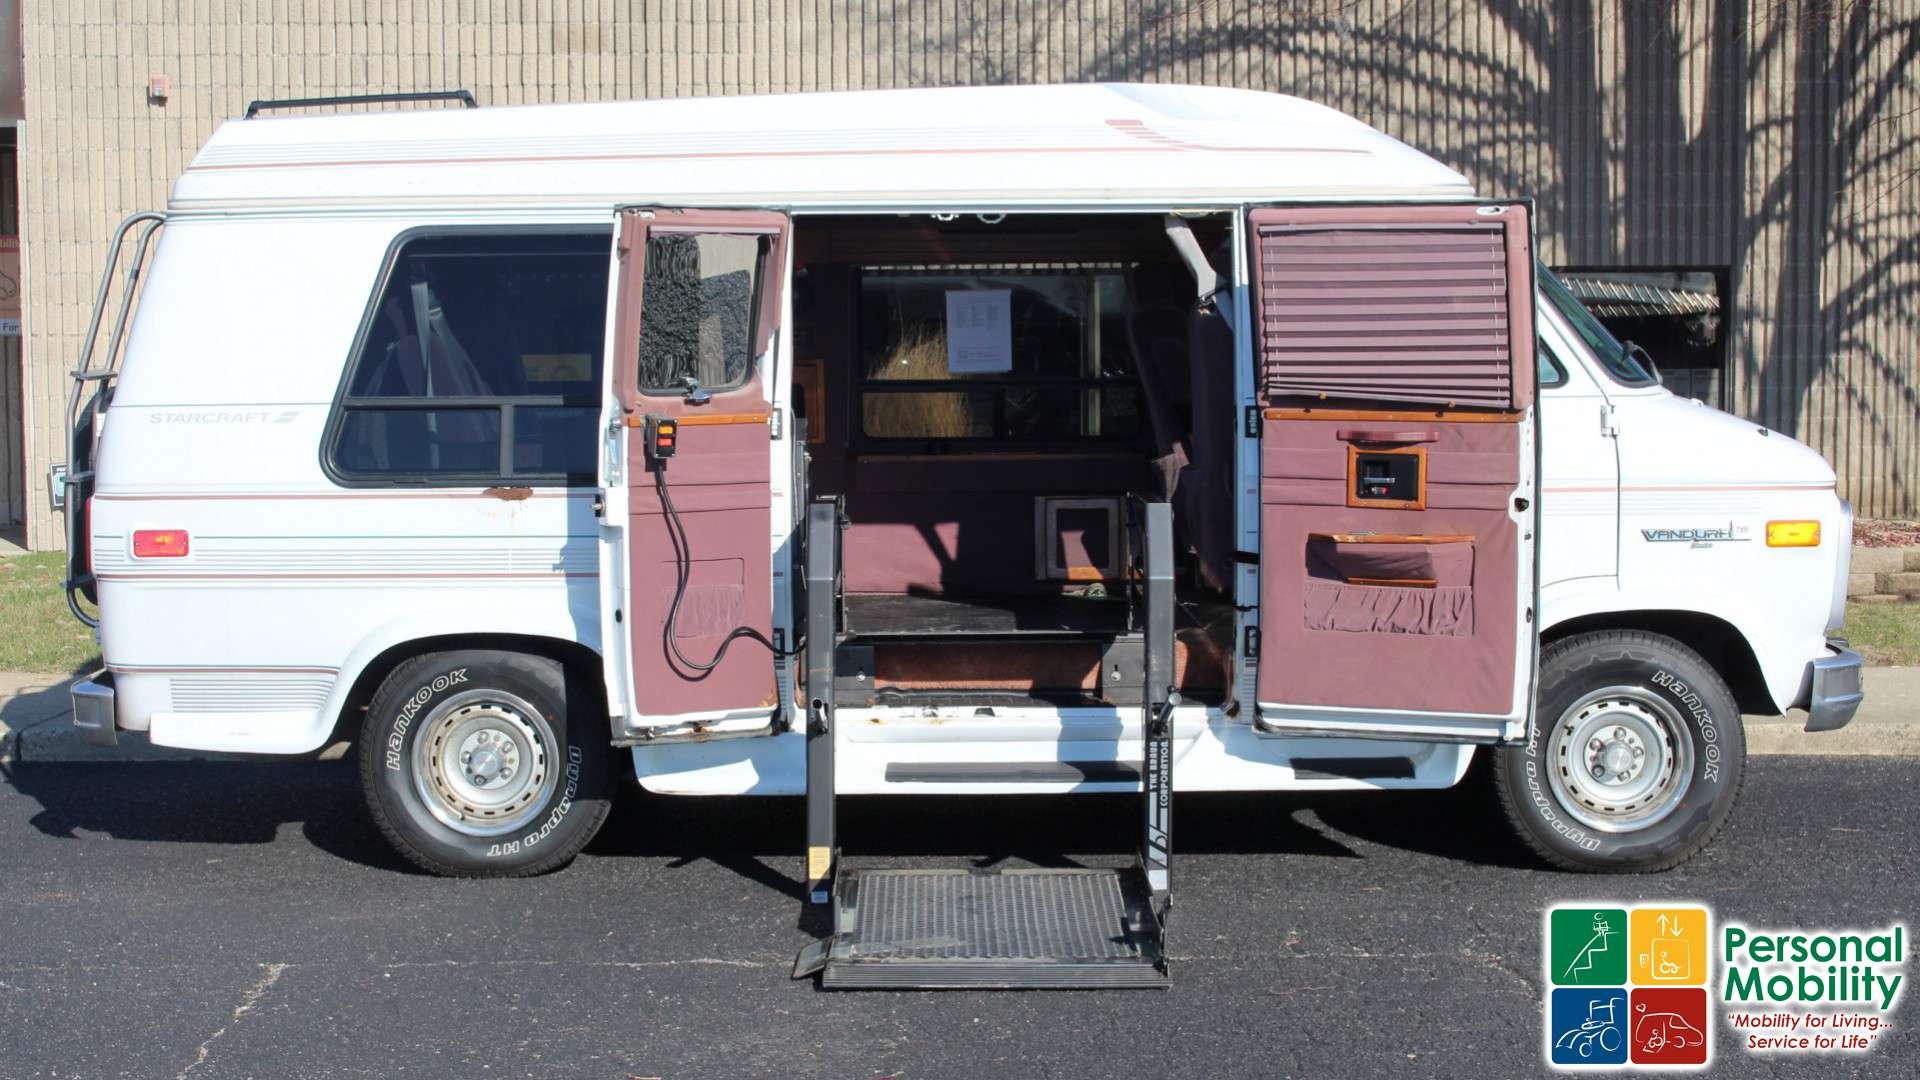 1995 Gmc Vandura Stock Wheelchair Van For Sale Personal Mobility